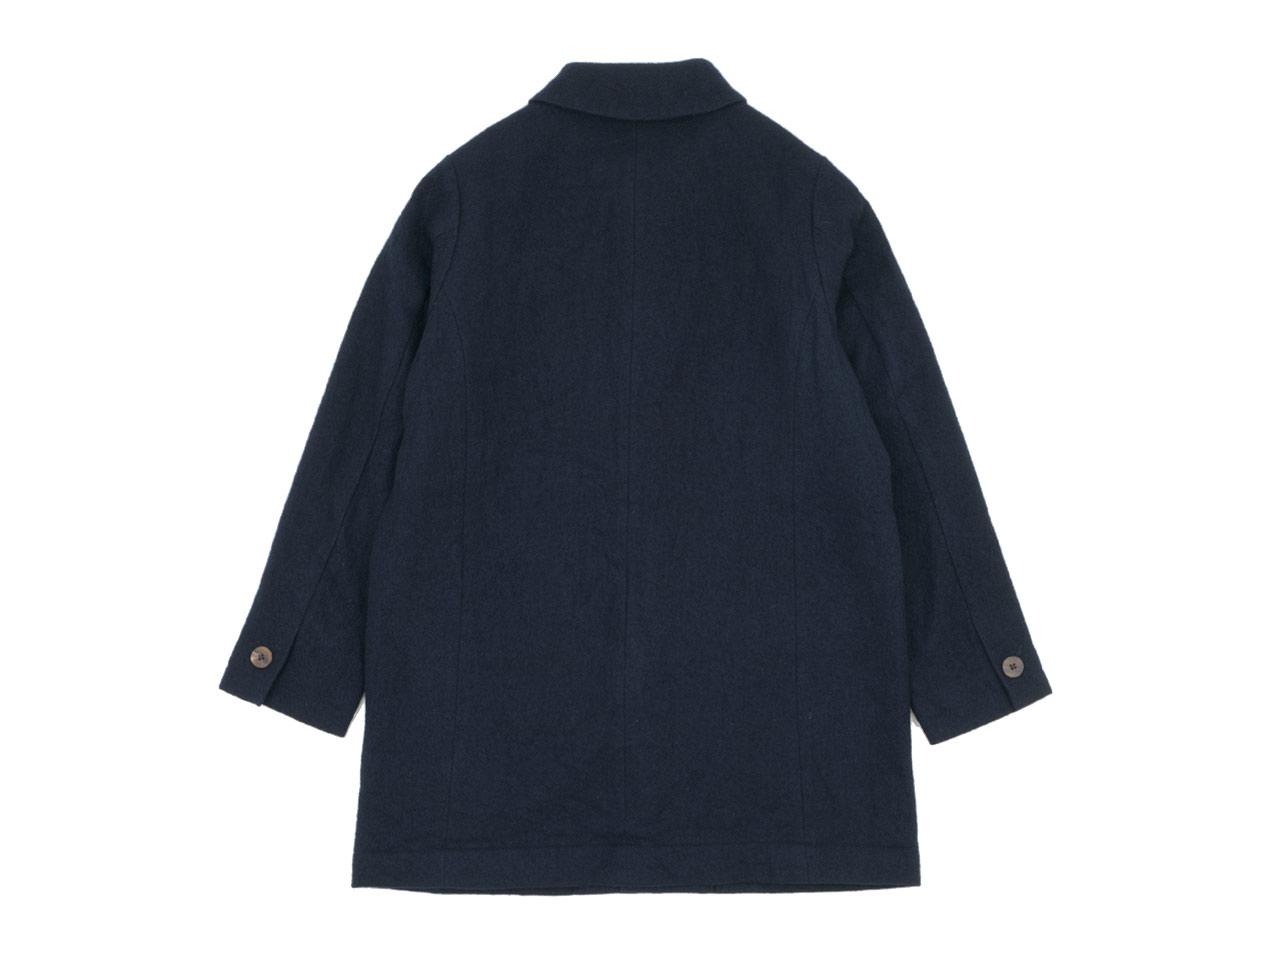 RINEN 2/48ウール綾織 コート